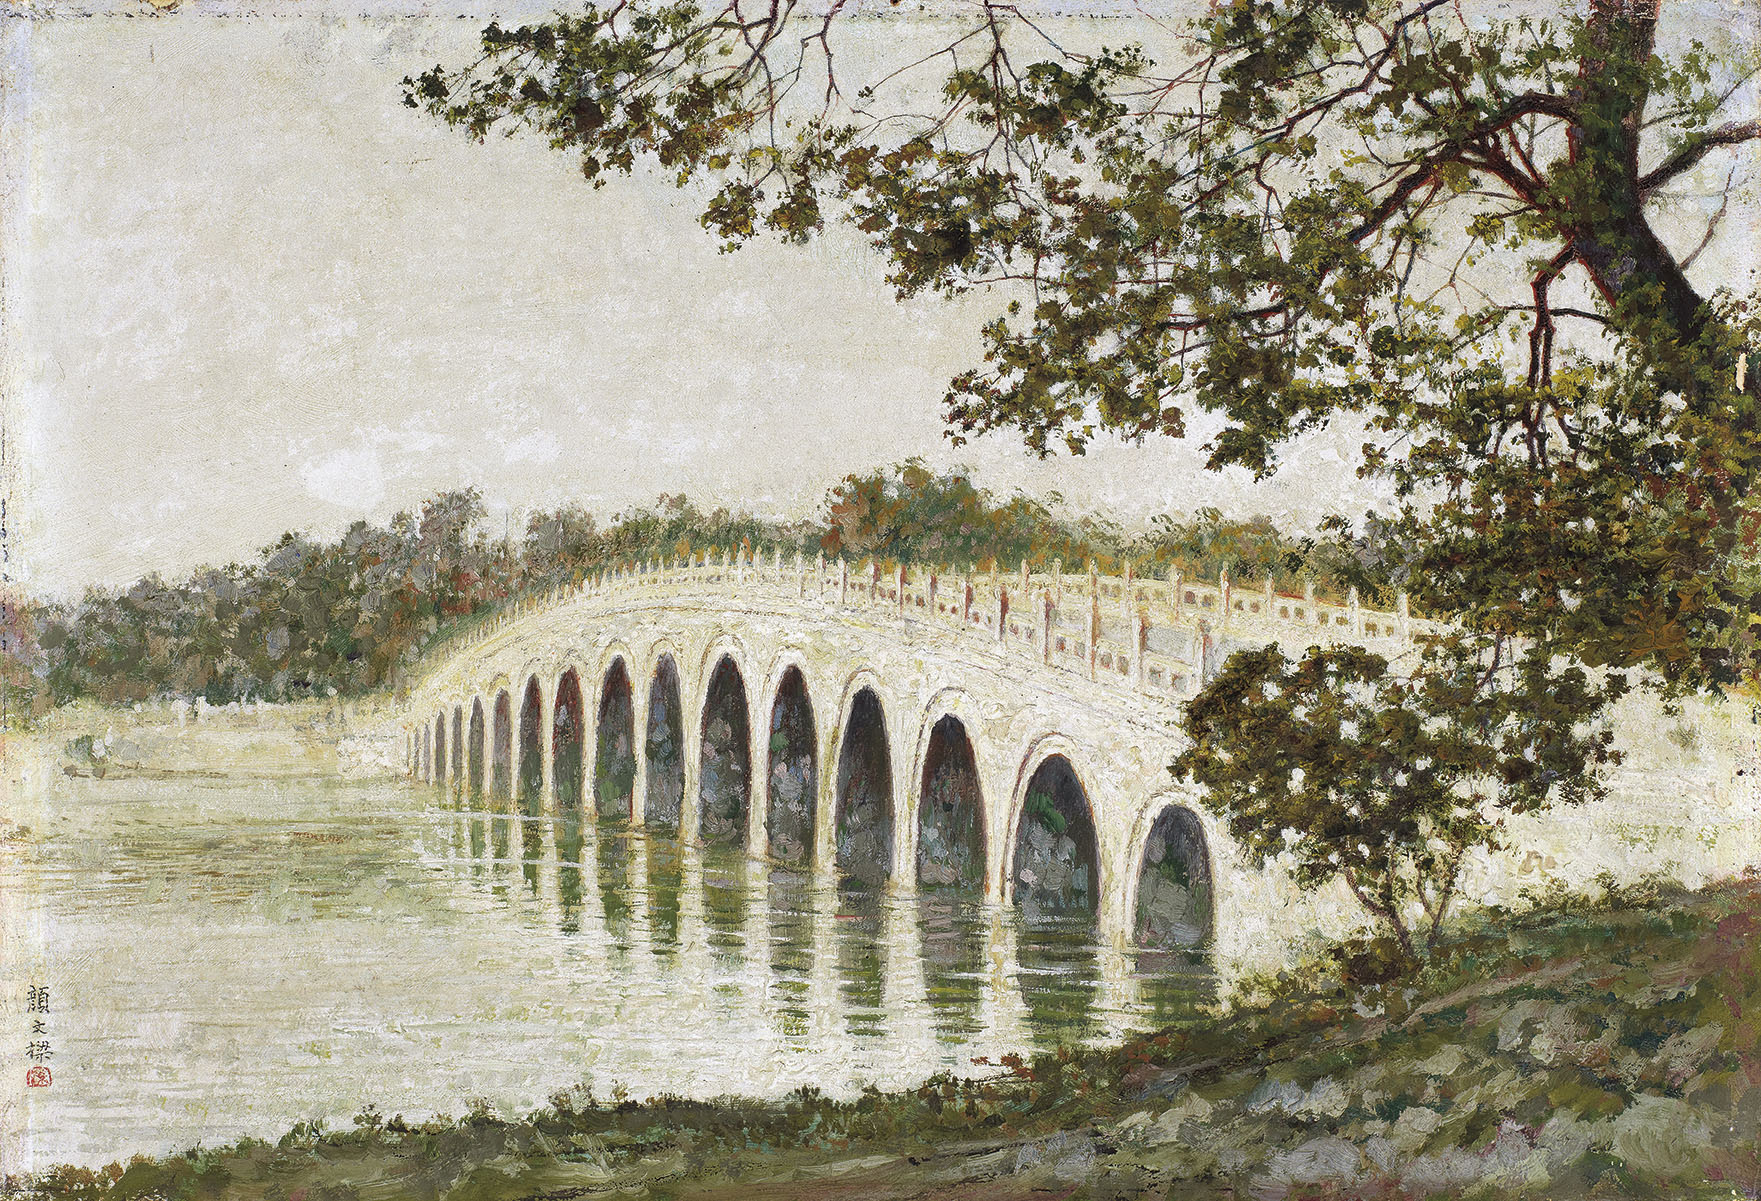 Seventeen Arches Bridge